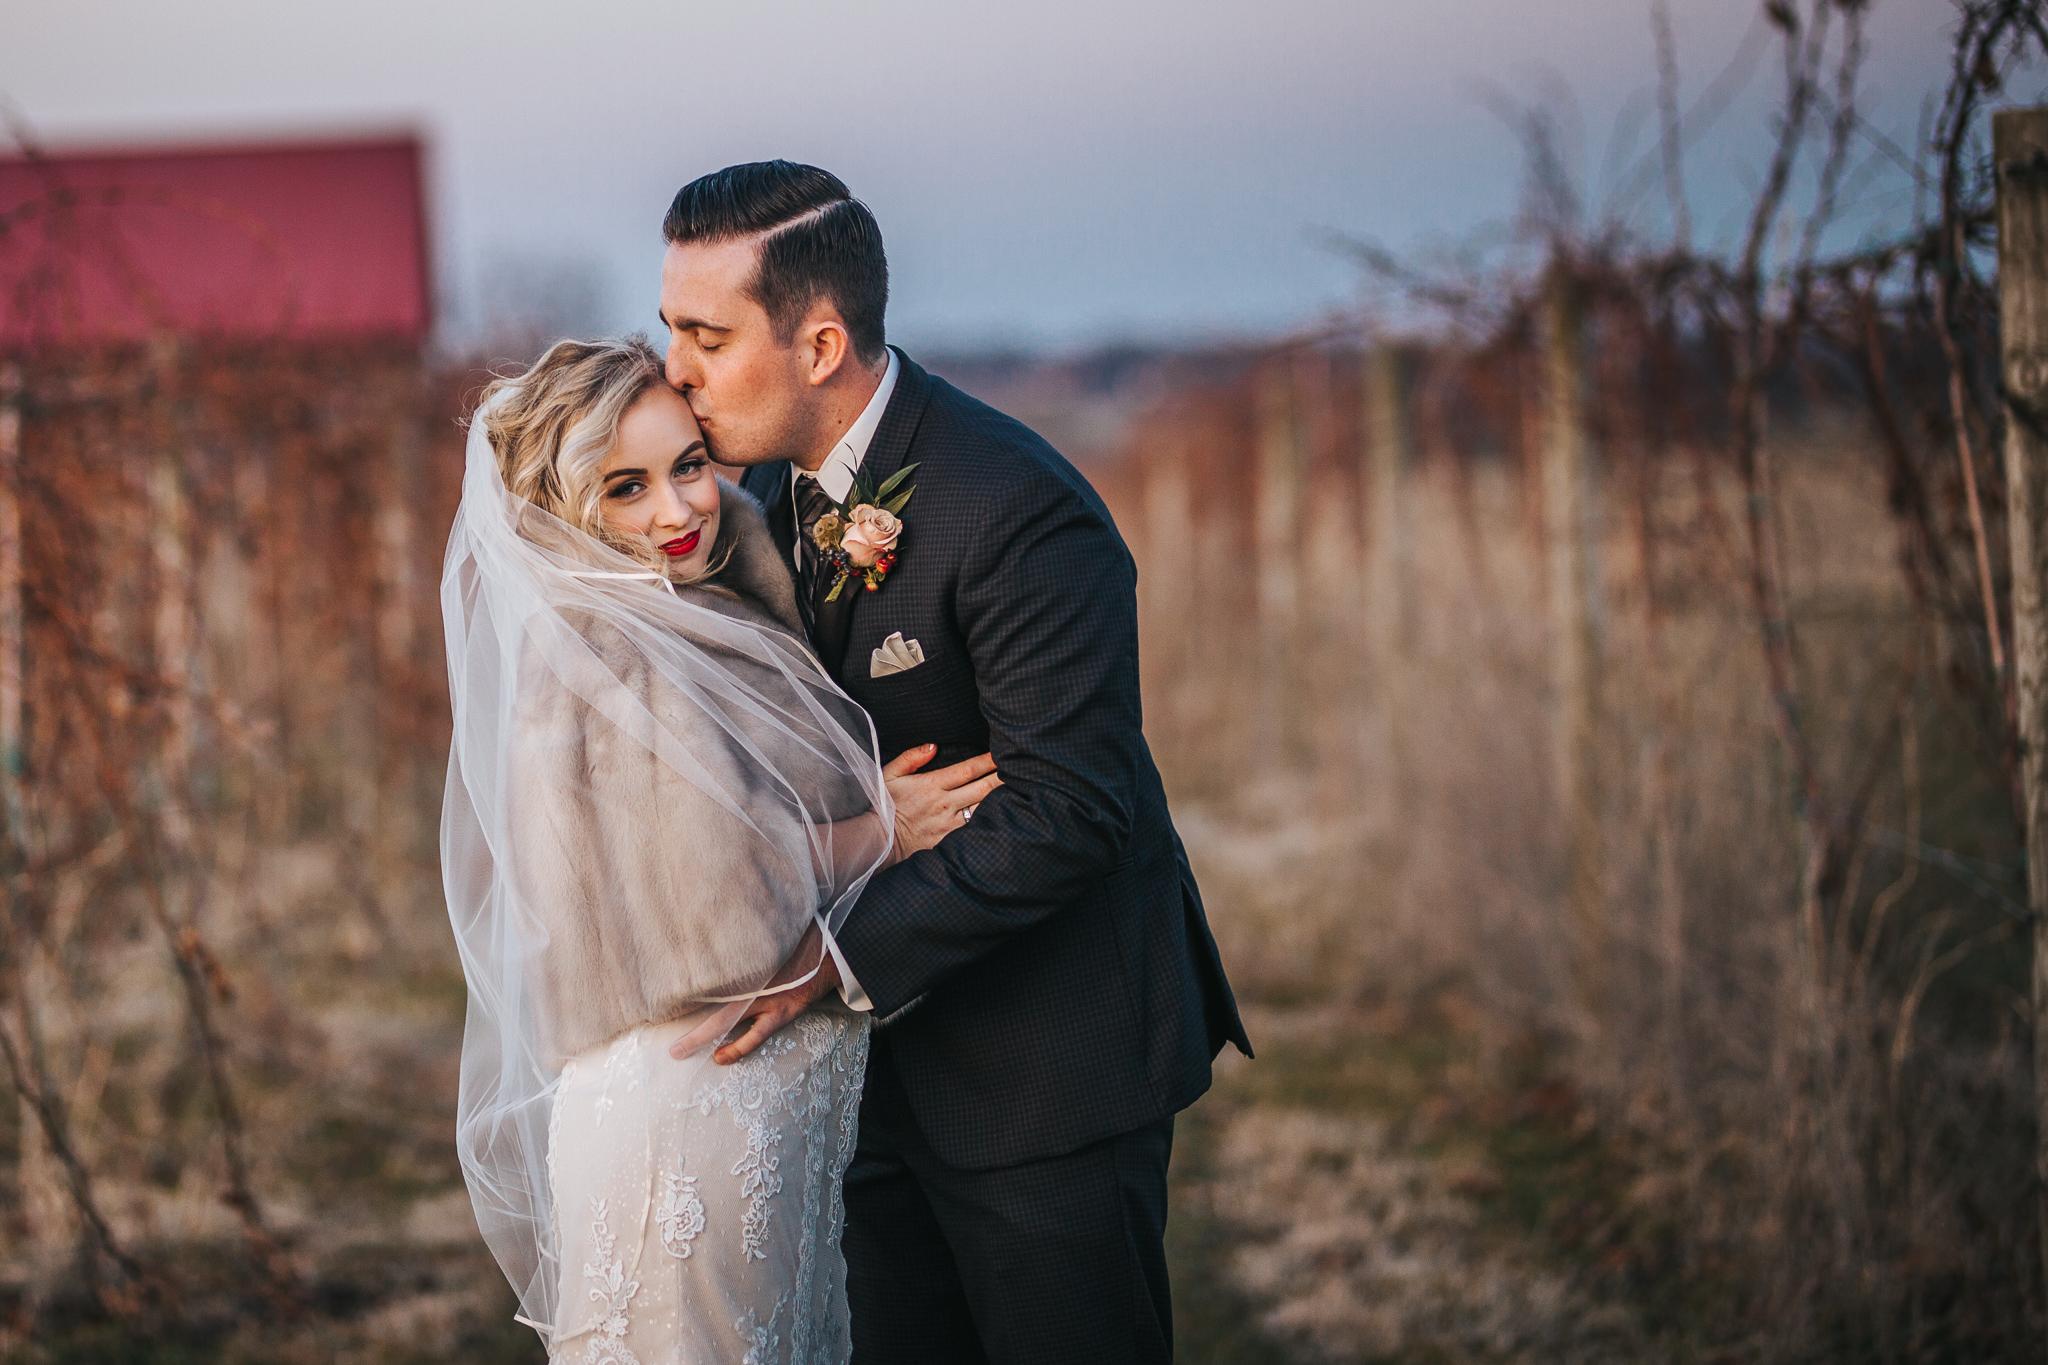 0113 Ariana Jordan Photo - Cameron & Lauren's Wedding at Talon Winery  4312.jpg